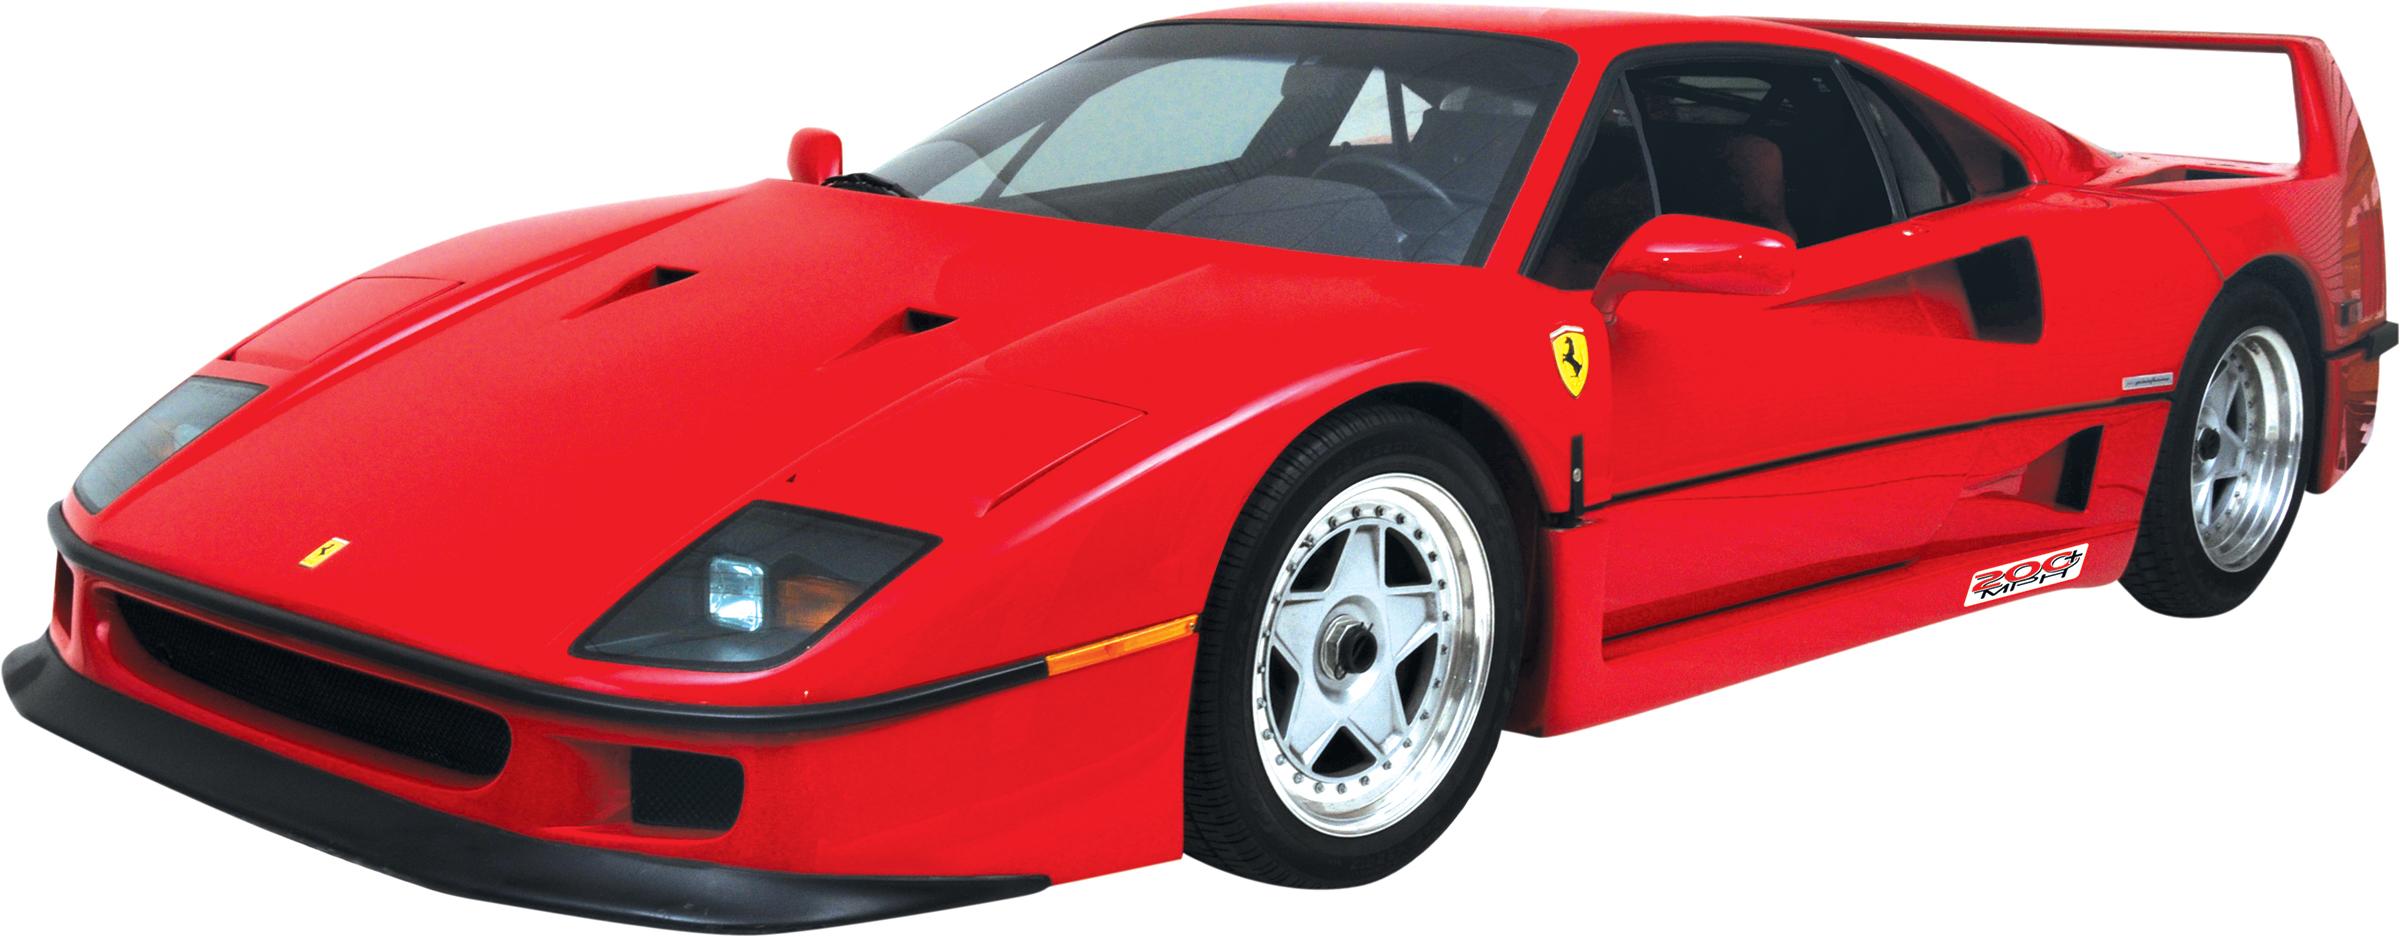 exotic-cars - F - Ferrari F40